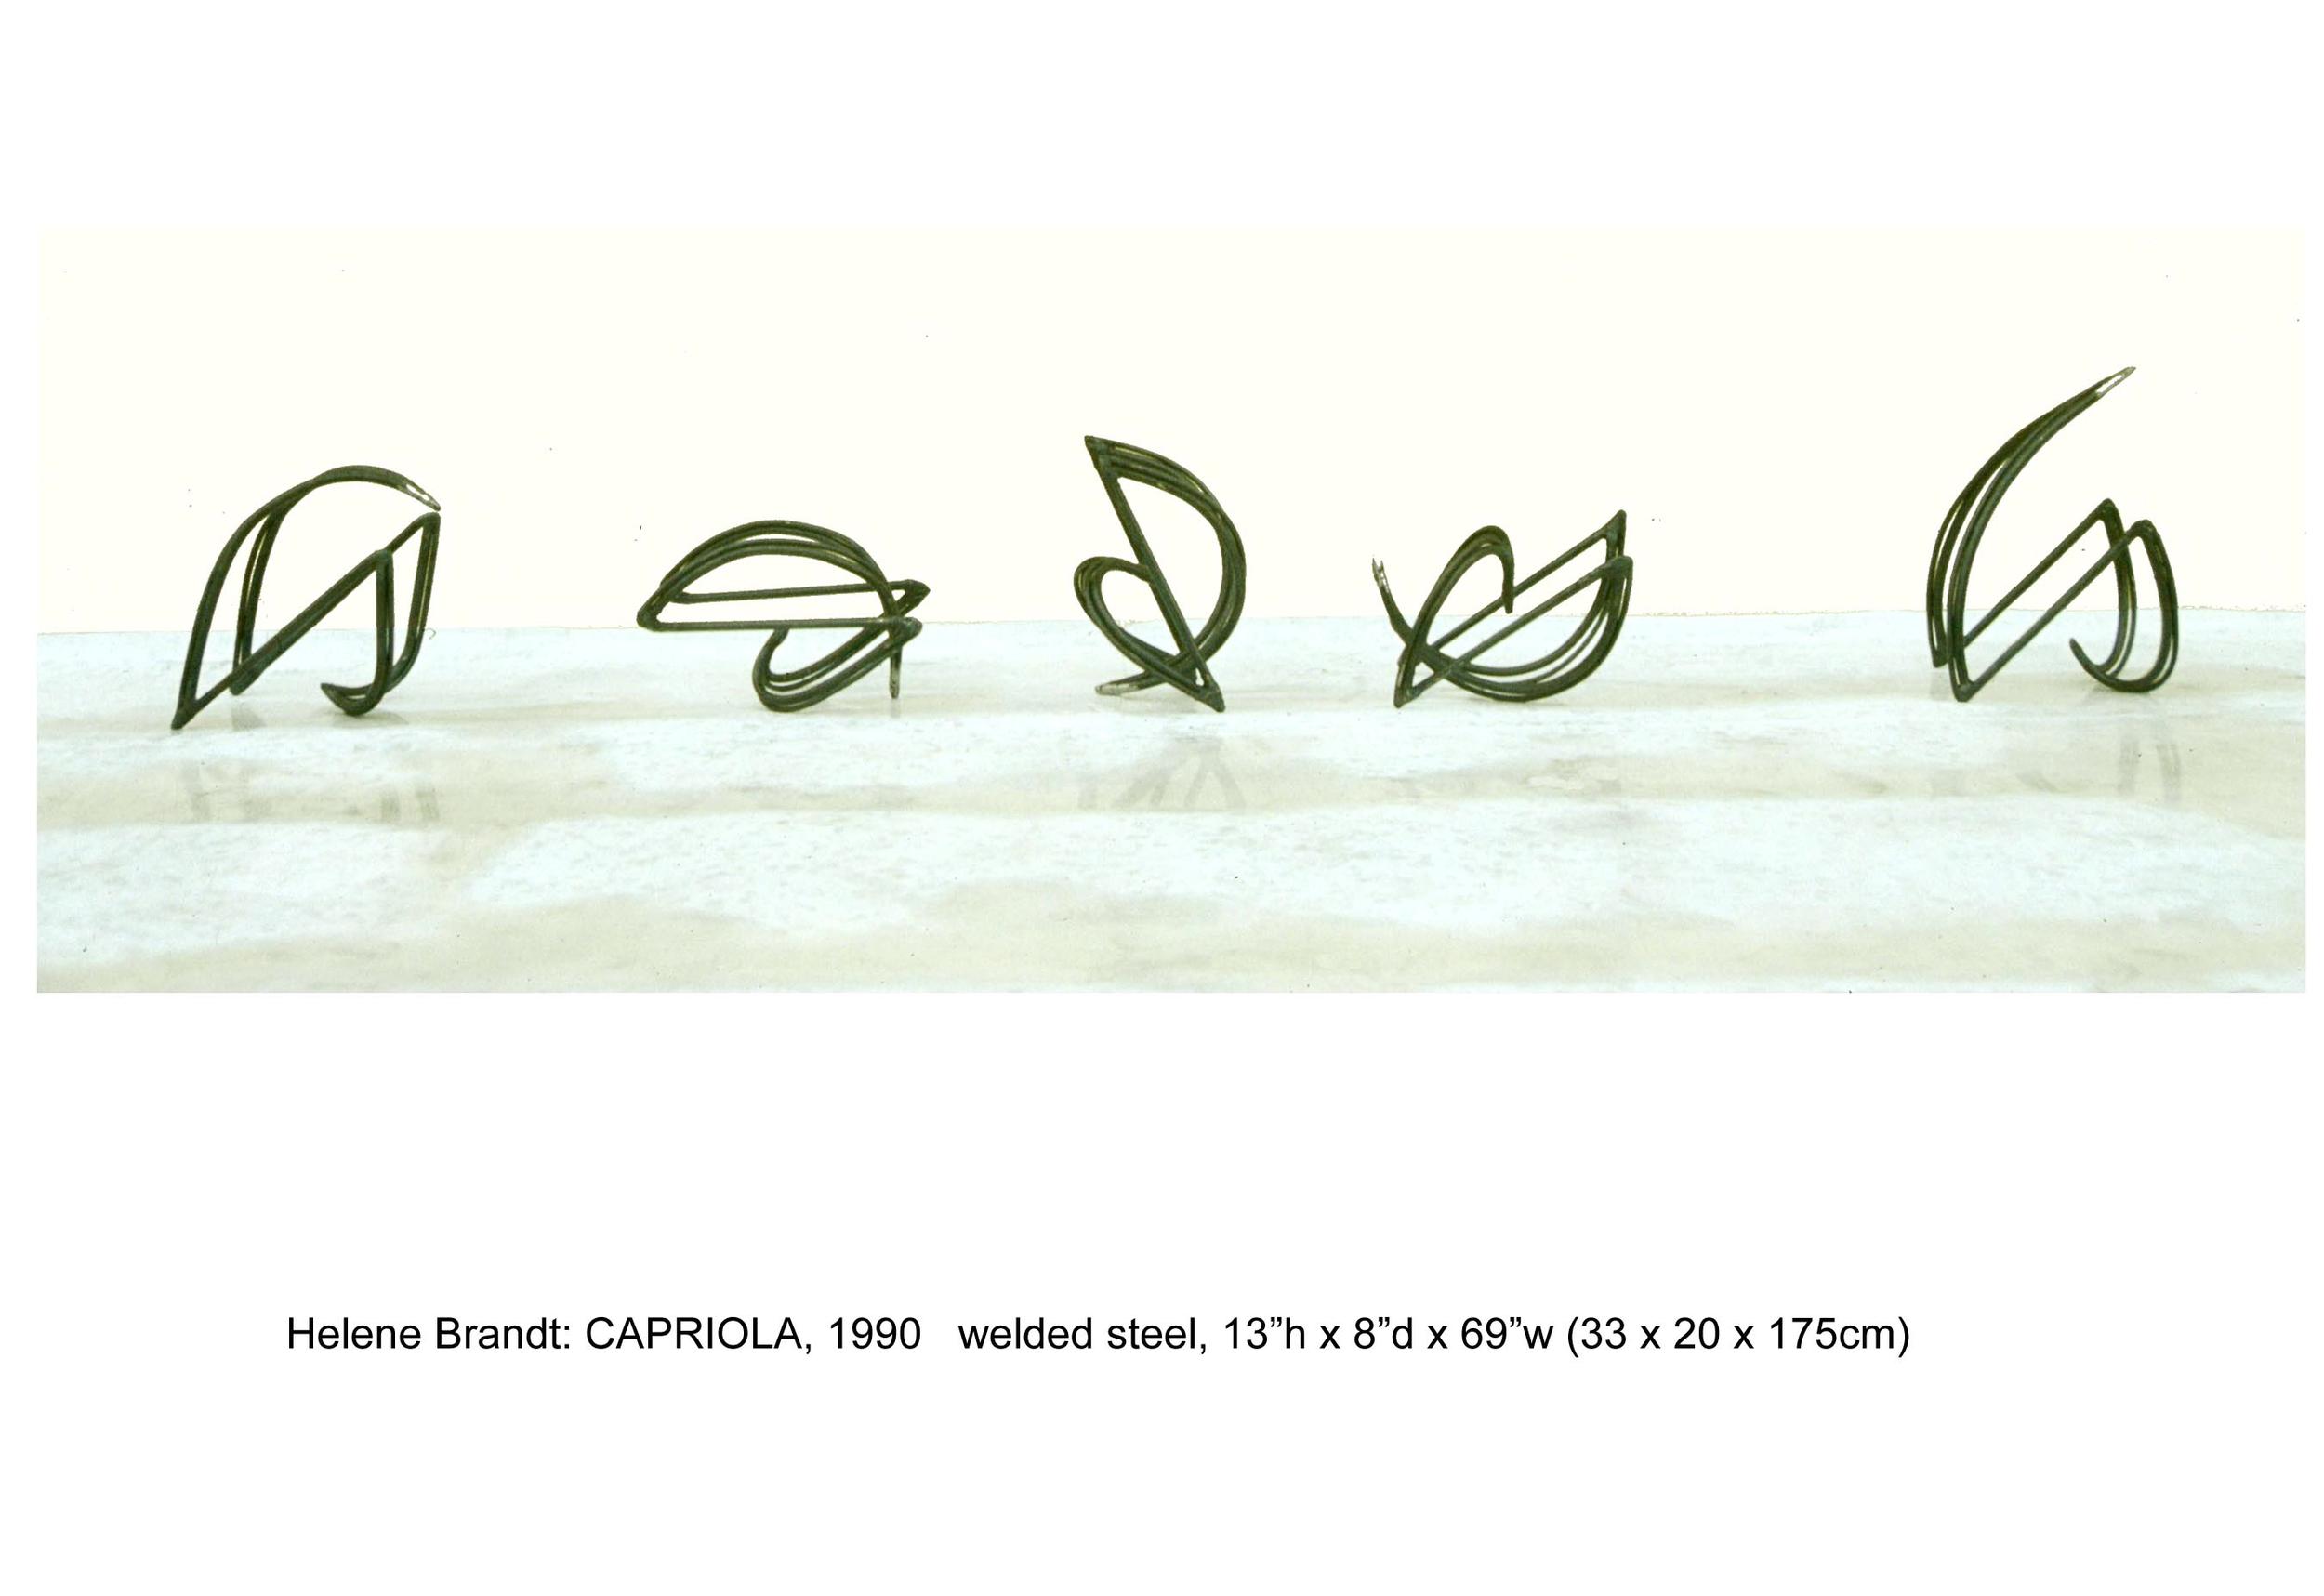 Capriola 1990